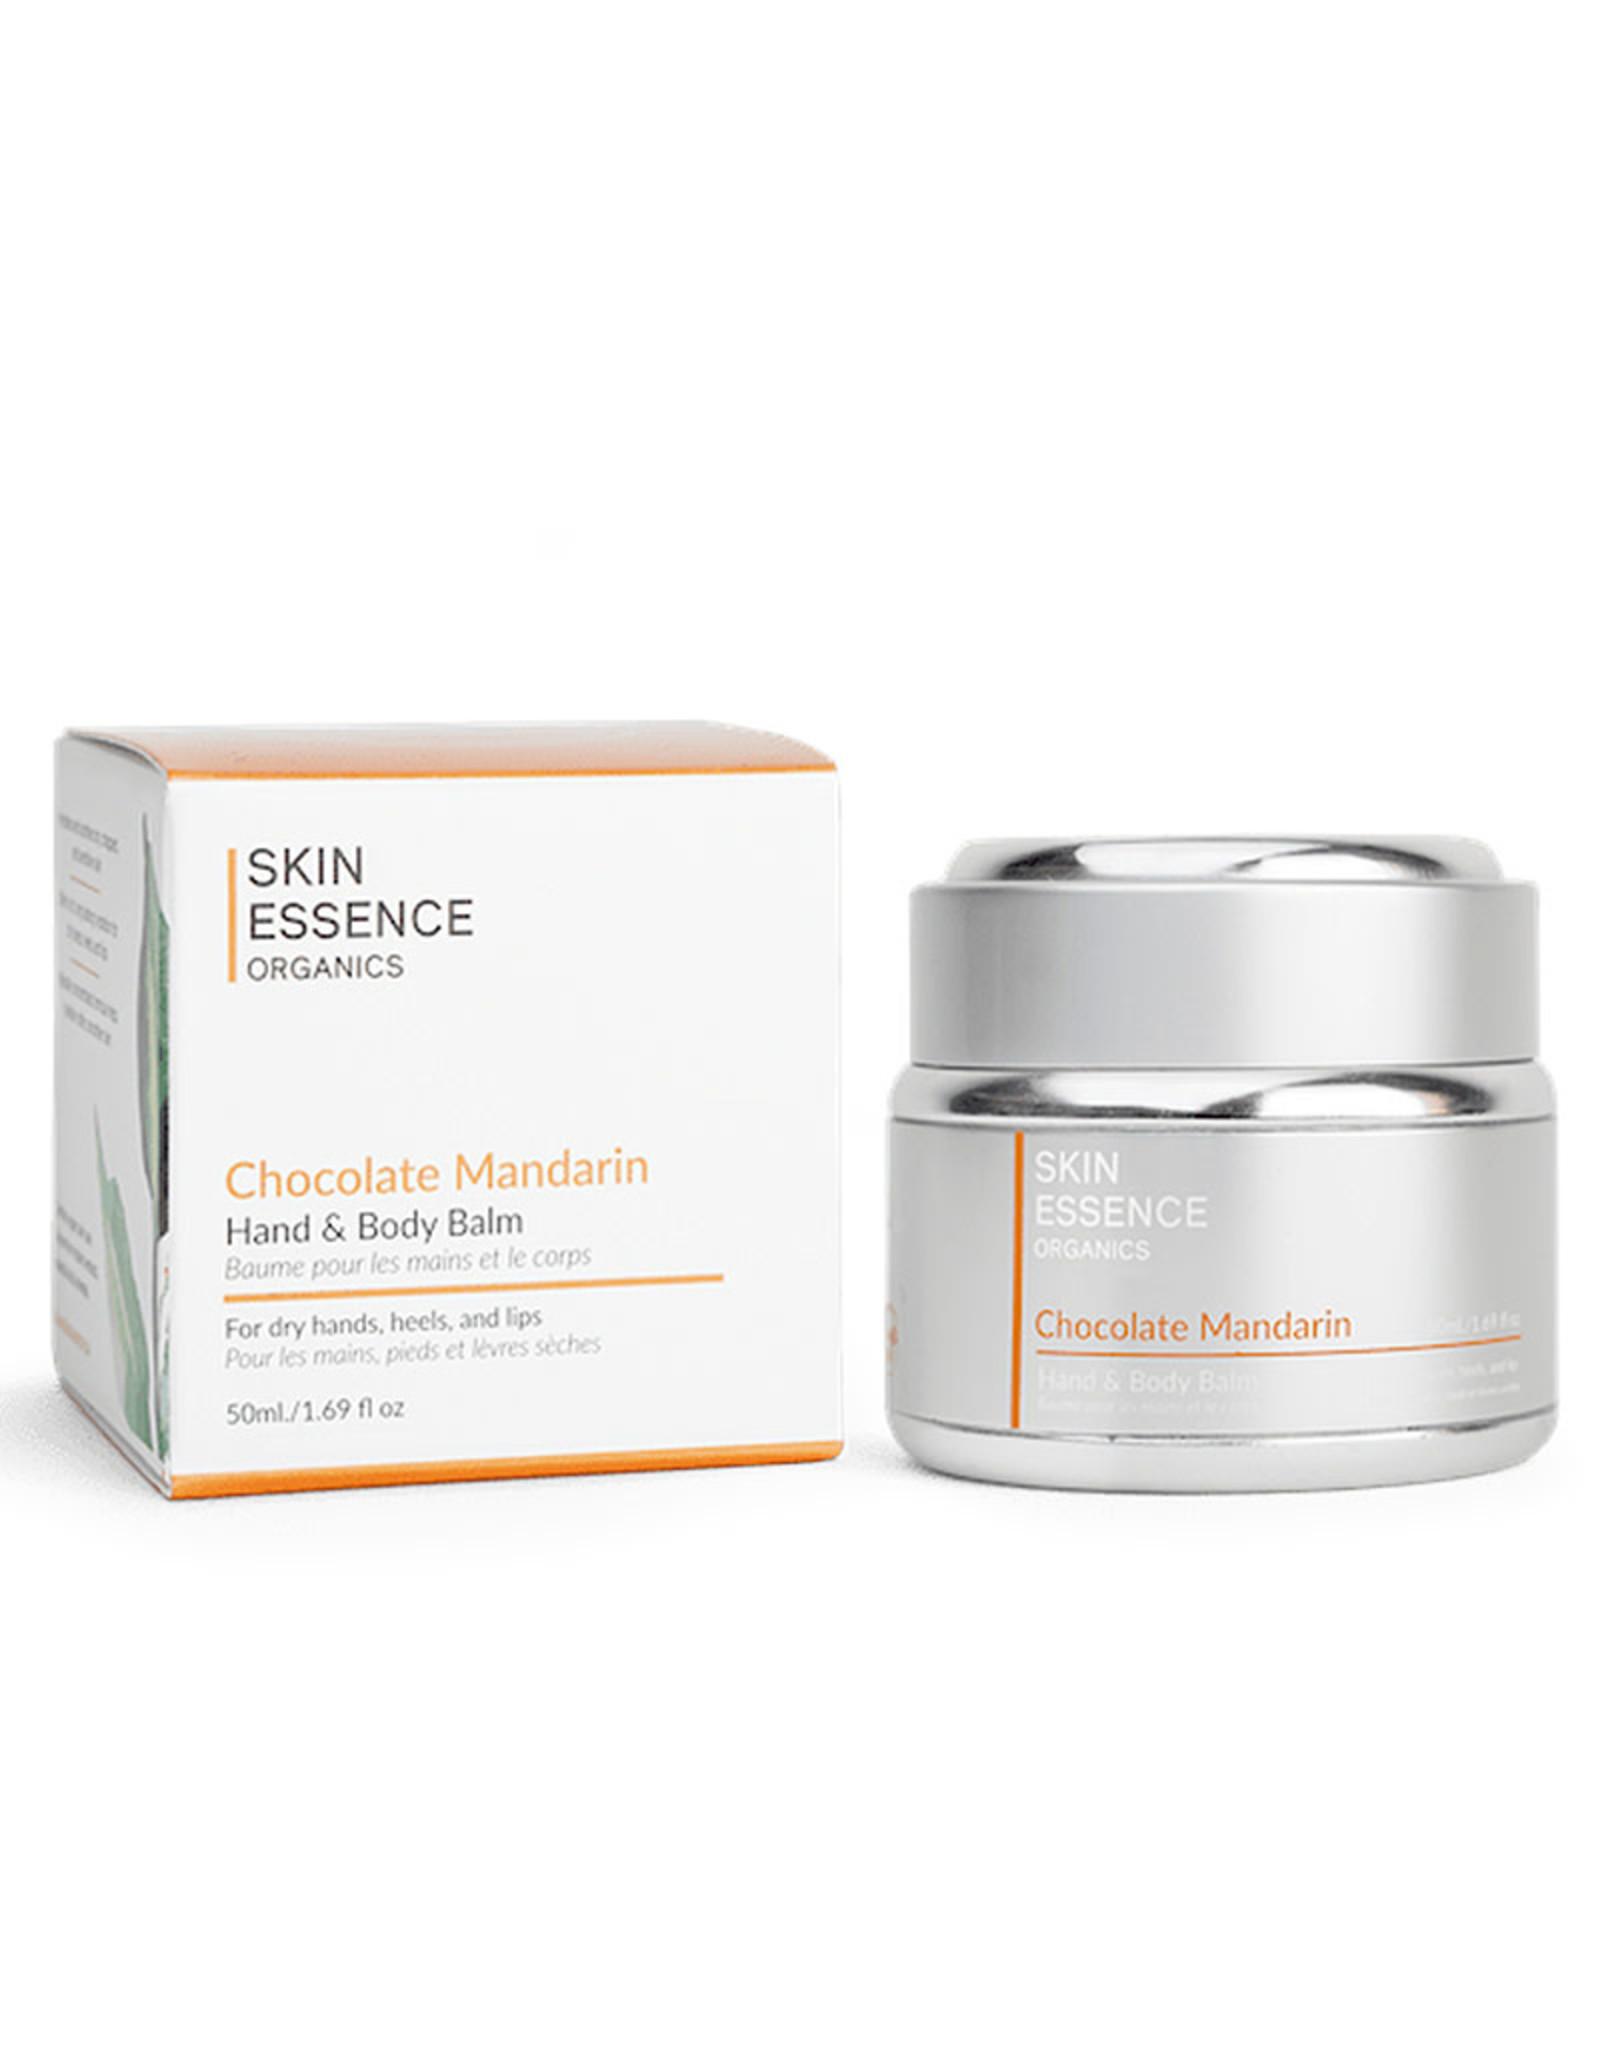 Skin Essence Skin Essence Organics - Hand & Body Balm, Chocolate Mandarin